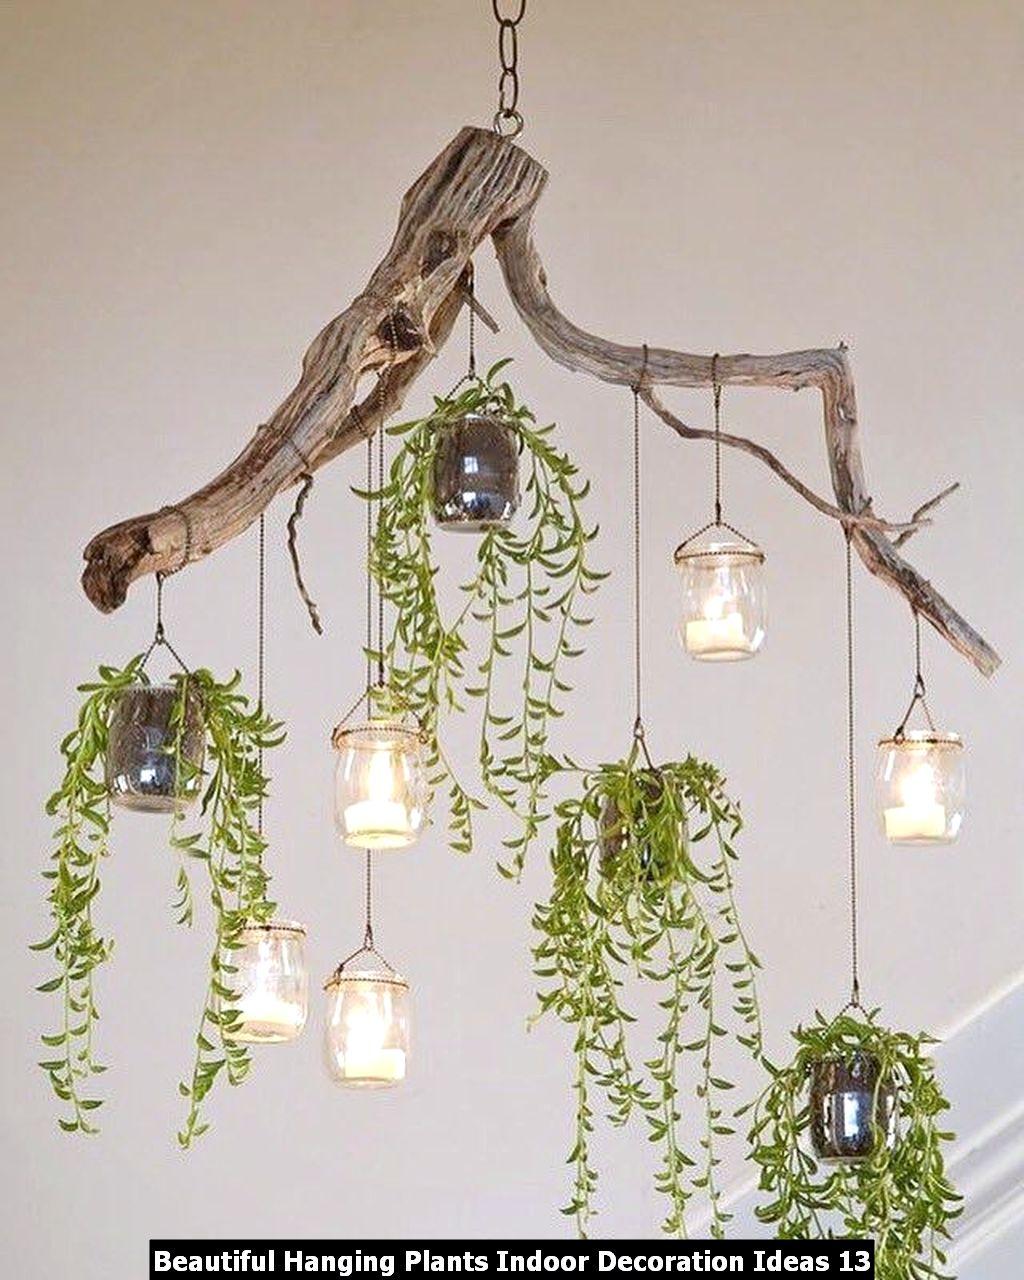 Beautiful Hanging Plants Indoor Decoration Ideas 13